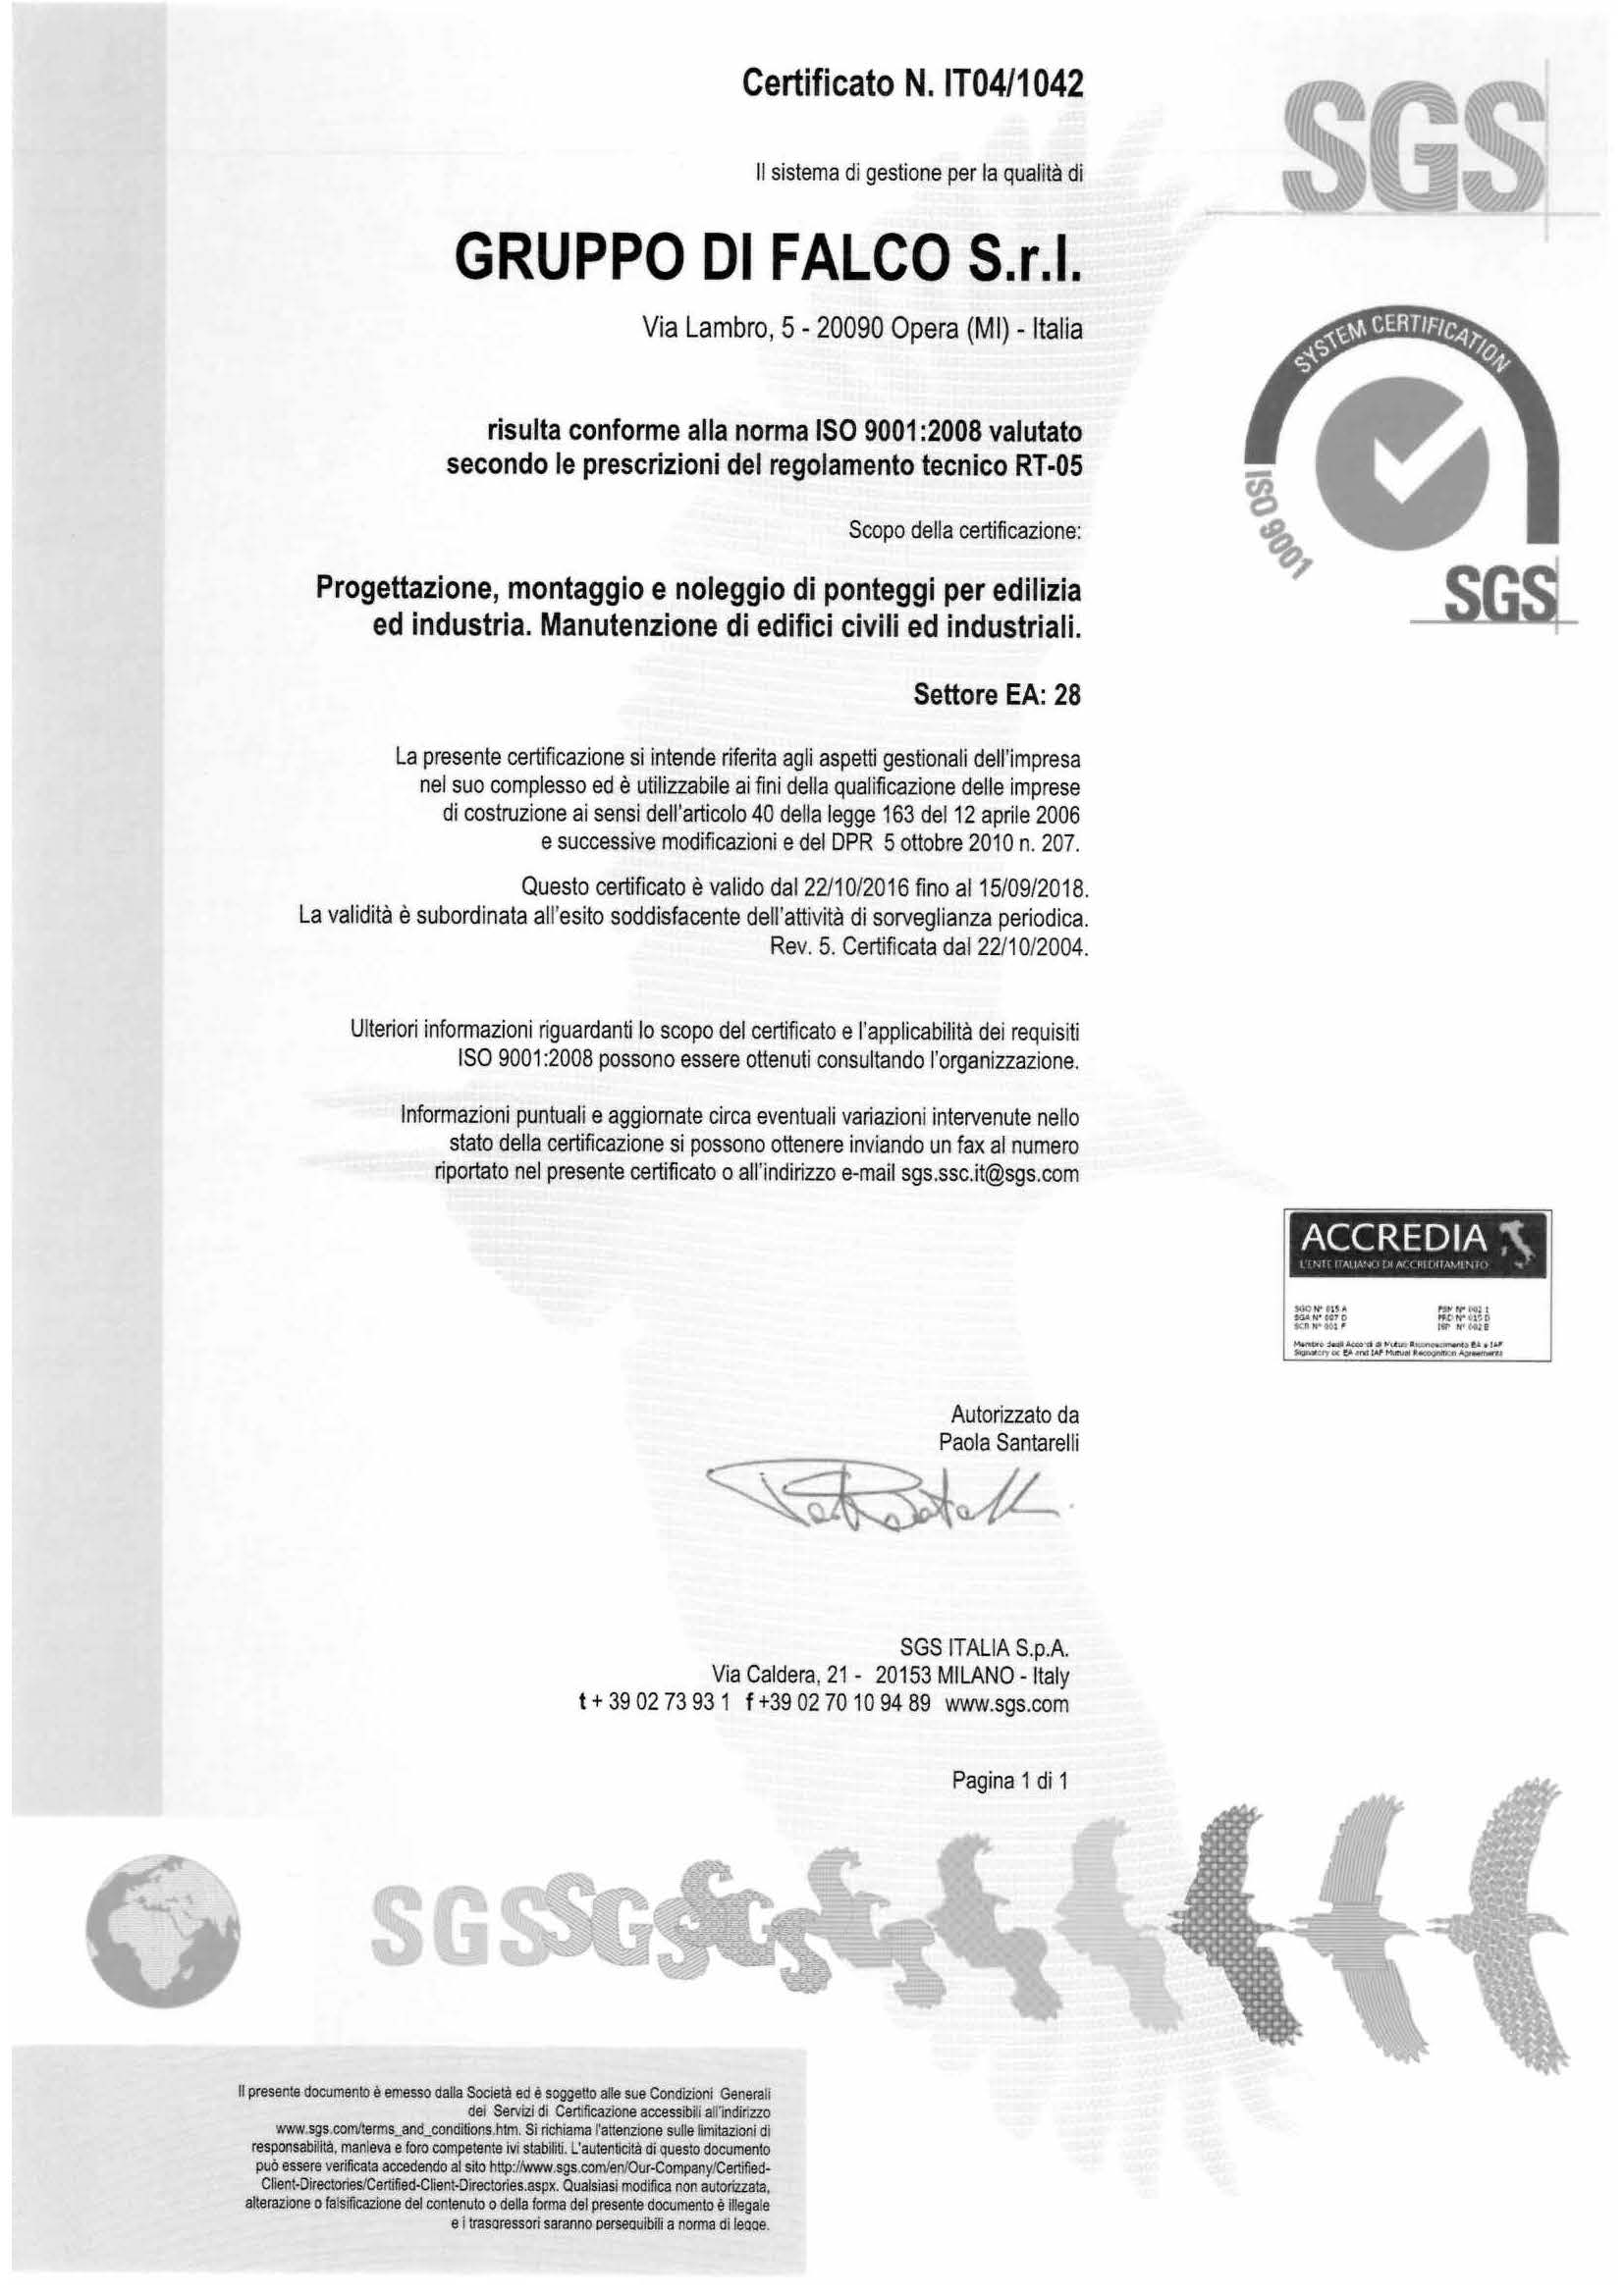 iso-9001-certificato-it04-1042-16